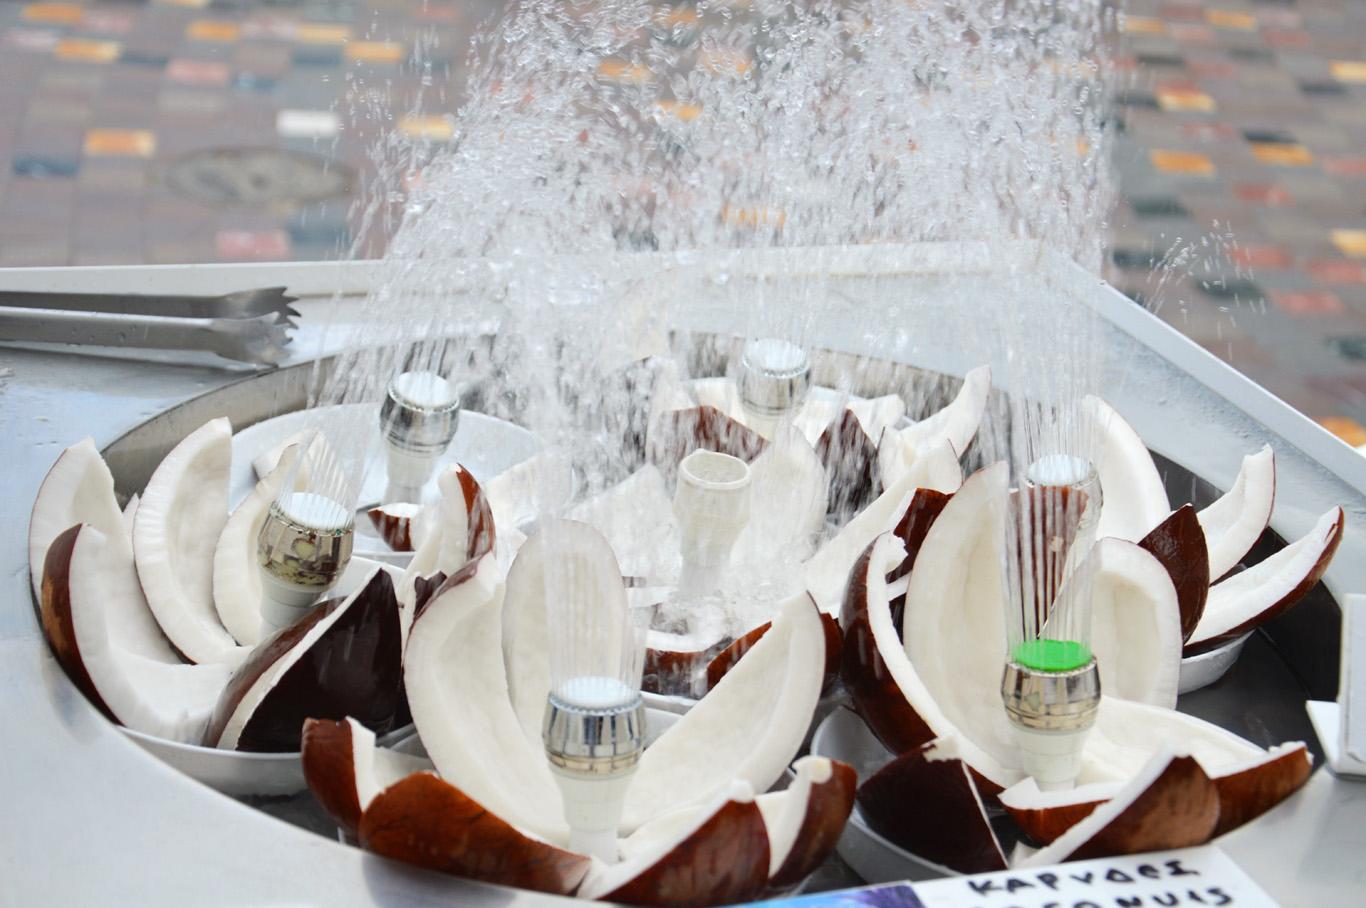 Drinking water fountains at Monastiraki